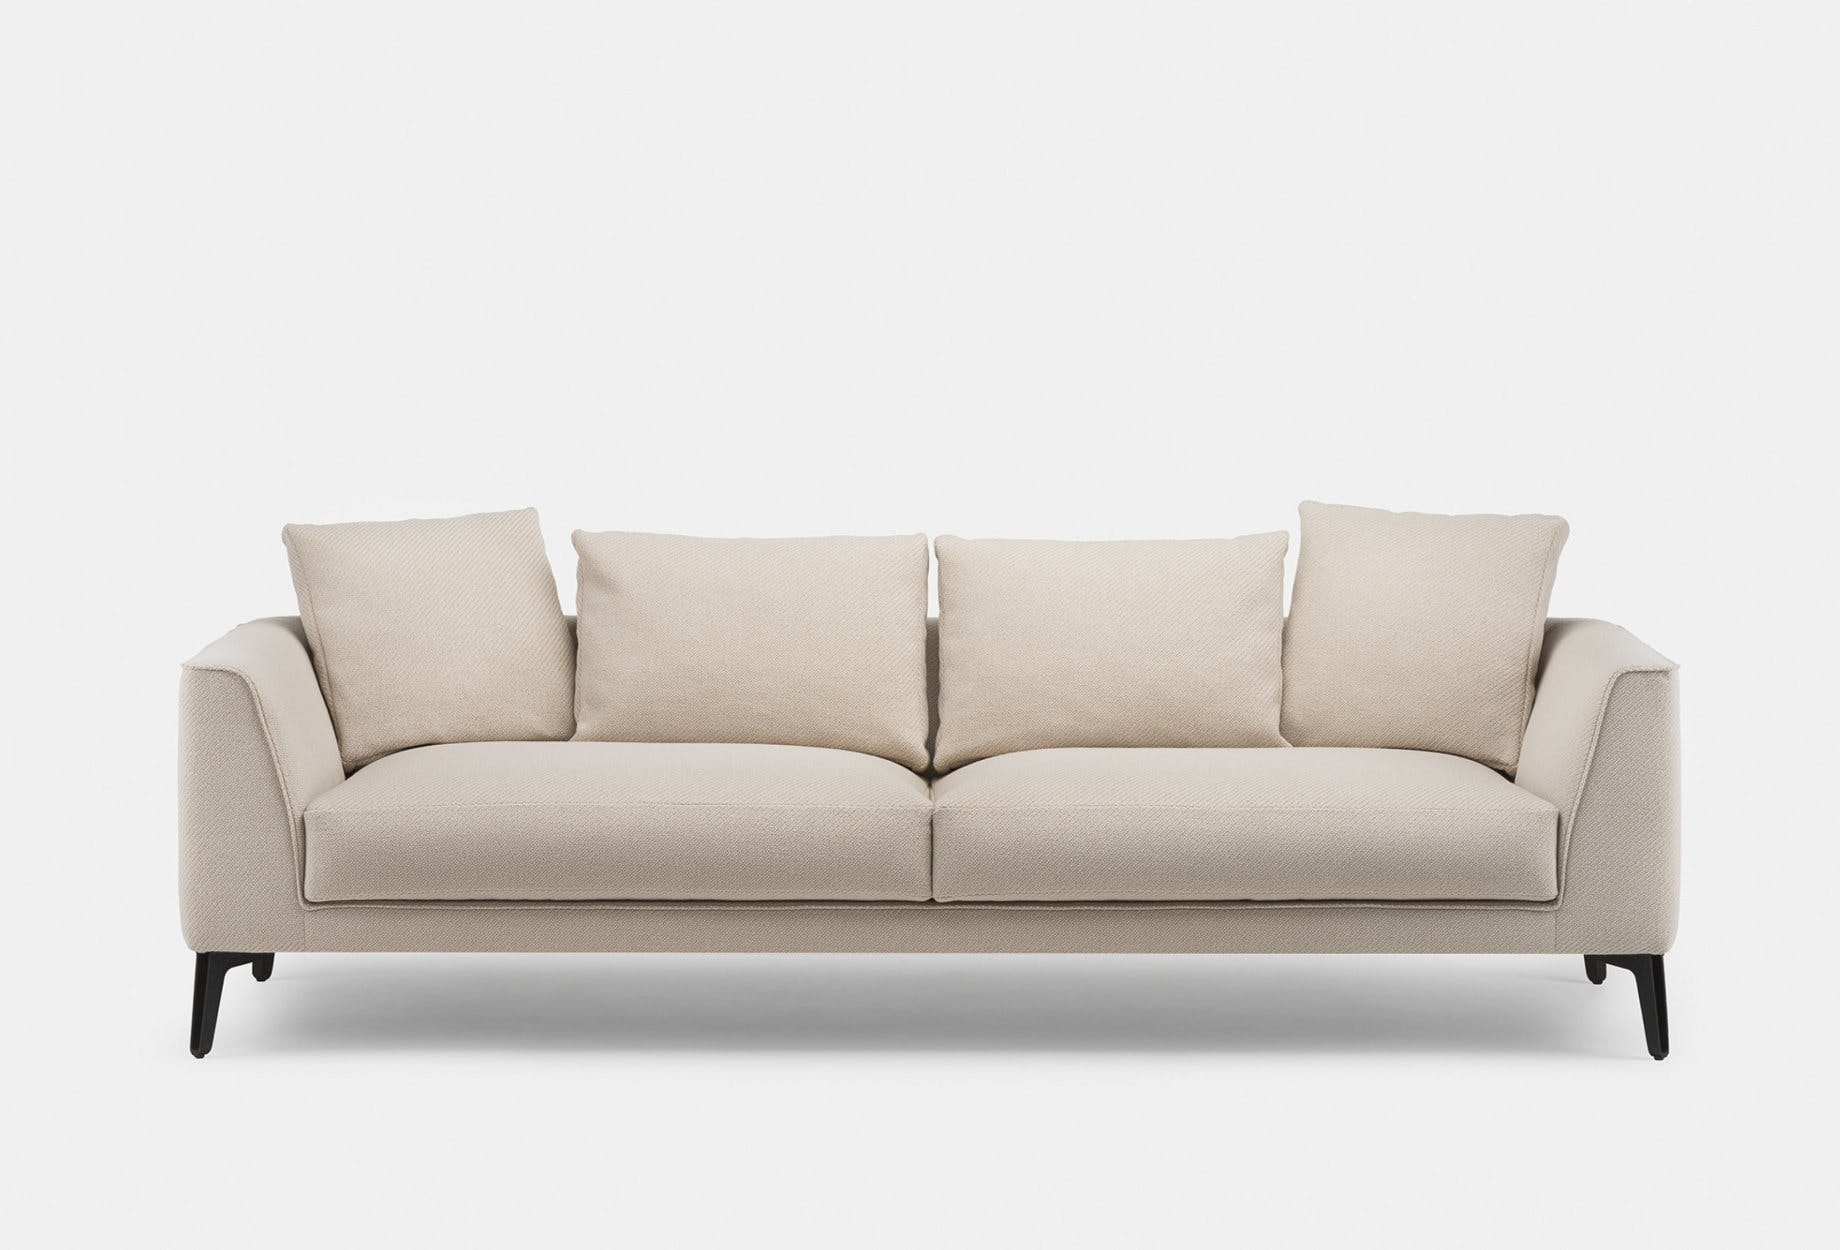 401 Mc Queen Sofa By Matthew Hilton In Coda 2 422 Fabric  Front2Web 1840X1250